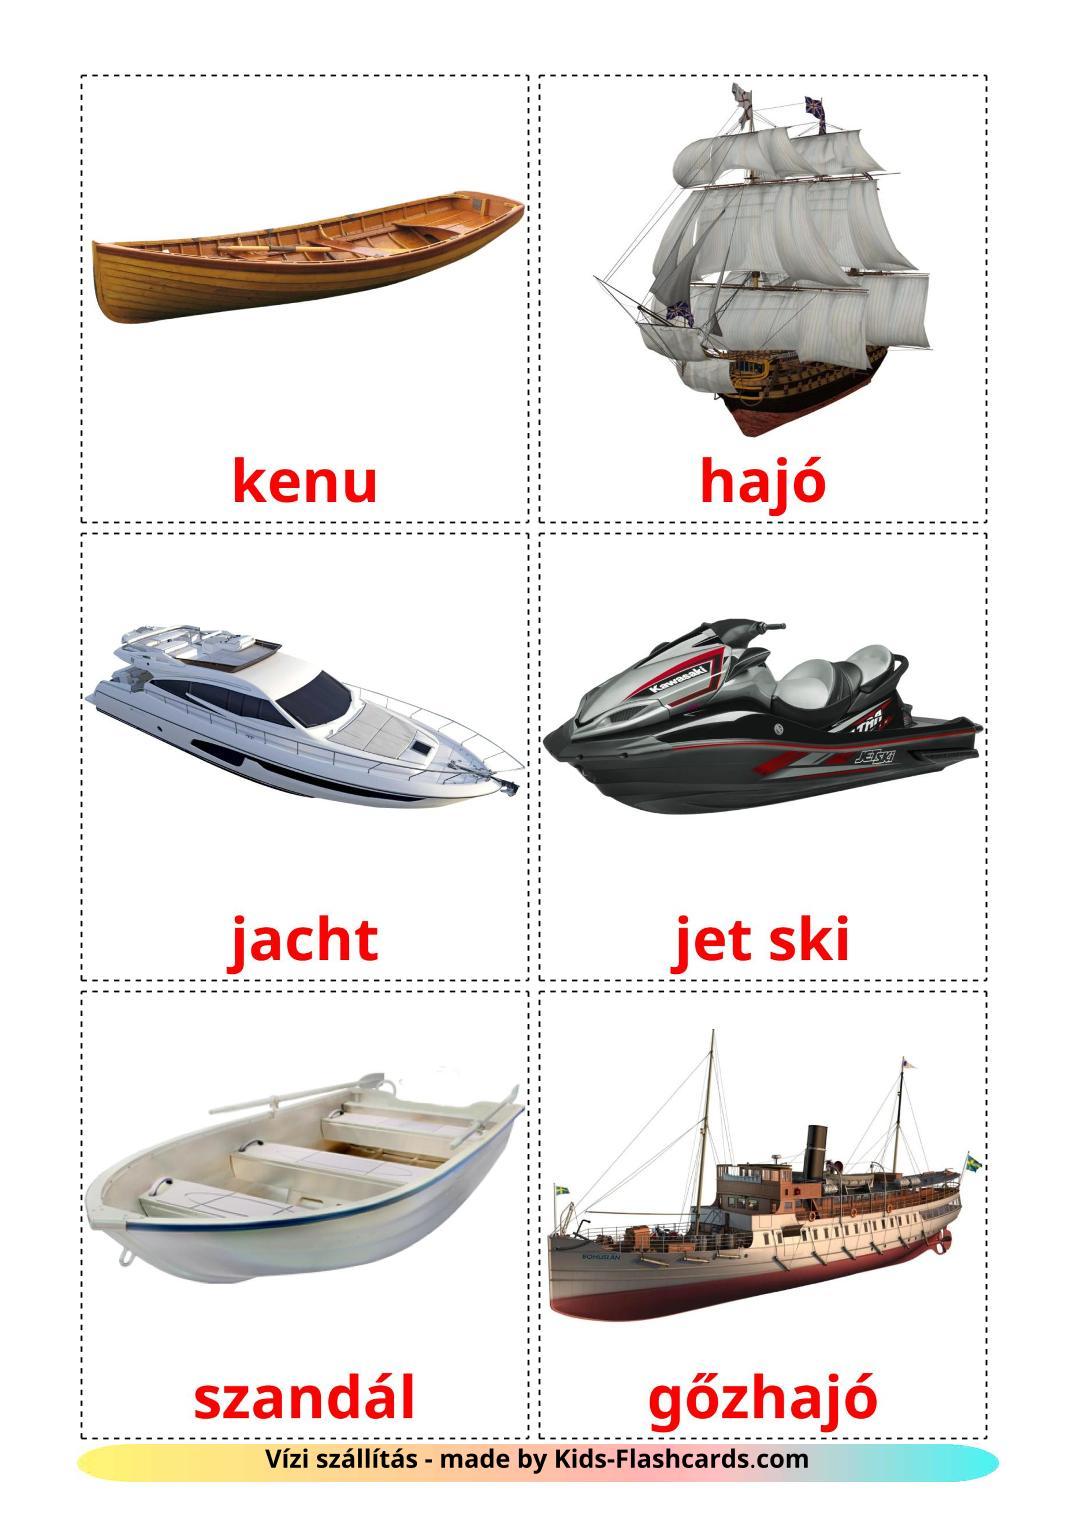 Water transport - 18 Free Printable hungarian Flashcards